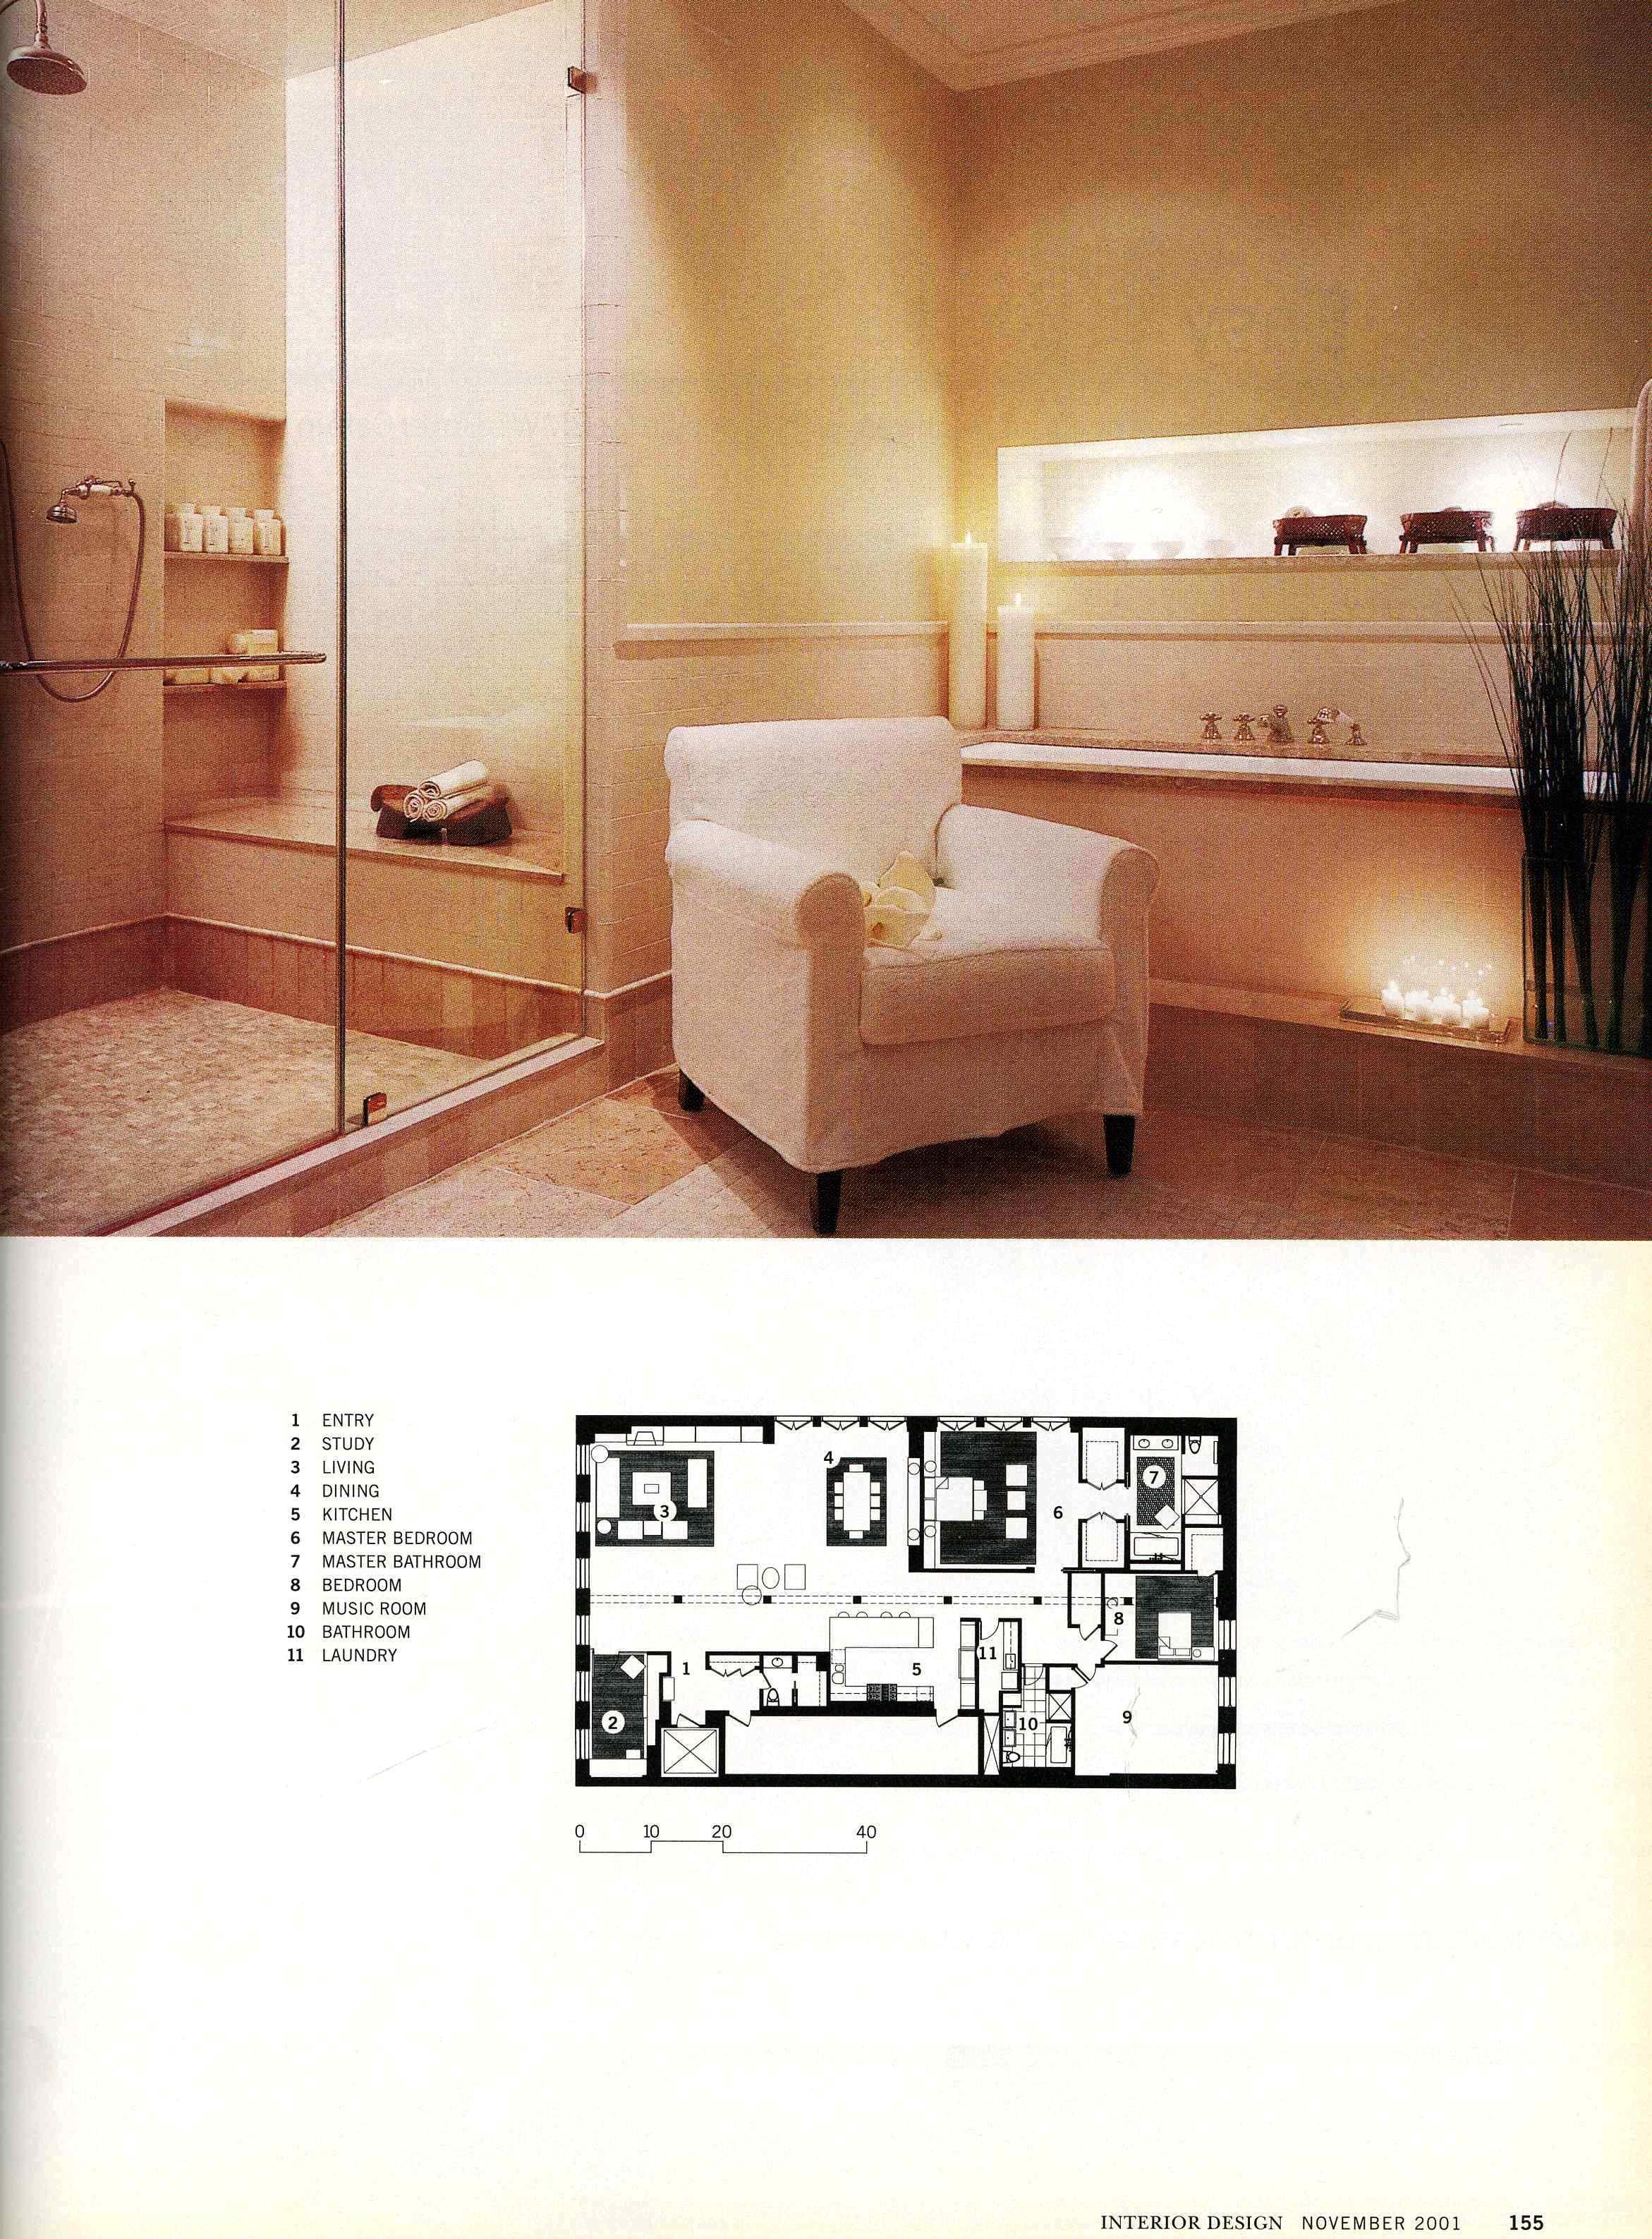 Interior Design_Nov 01_Savoy_Full Article_Page_9.jpg